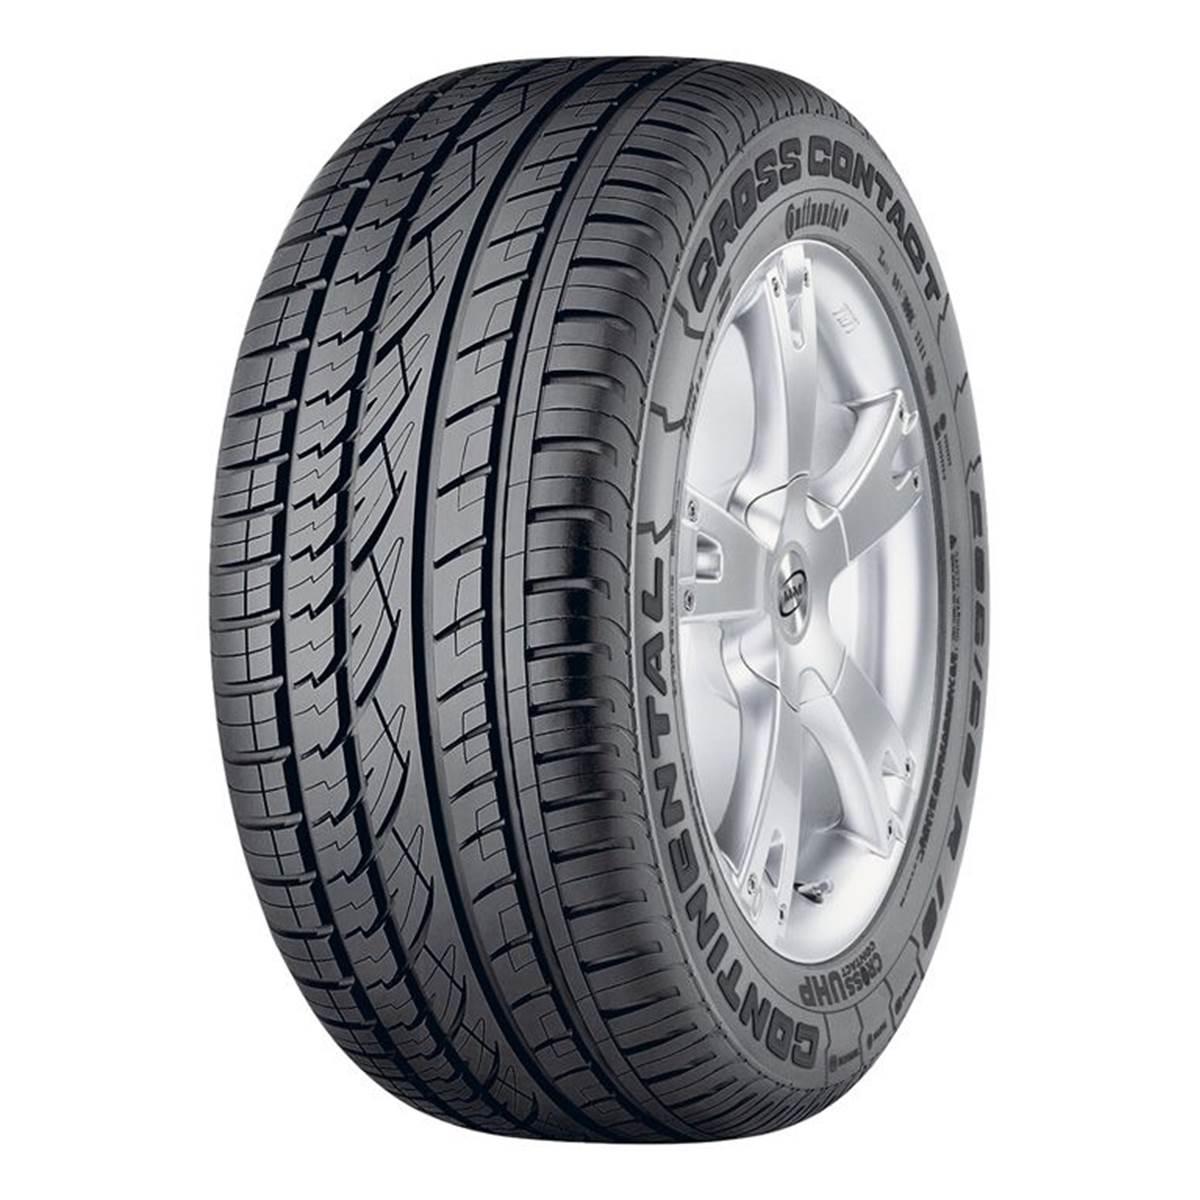 Pneu 4X4 Continental 275/50R20 109W Conticrosscont Uhp homologué Mercedes